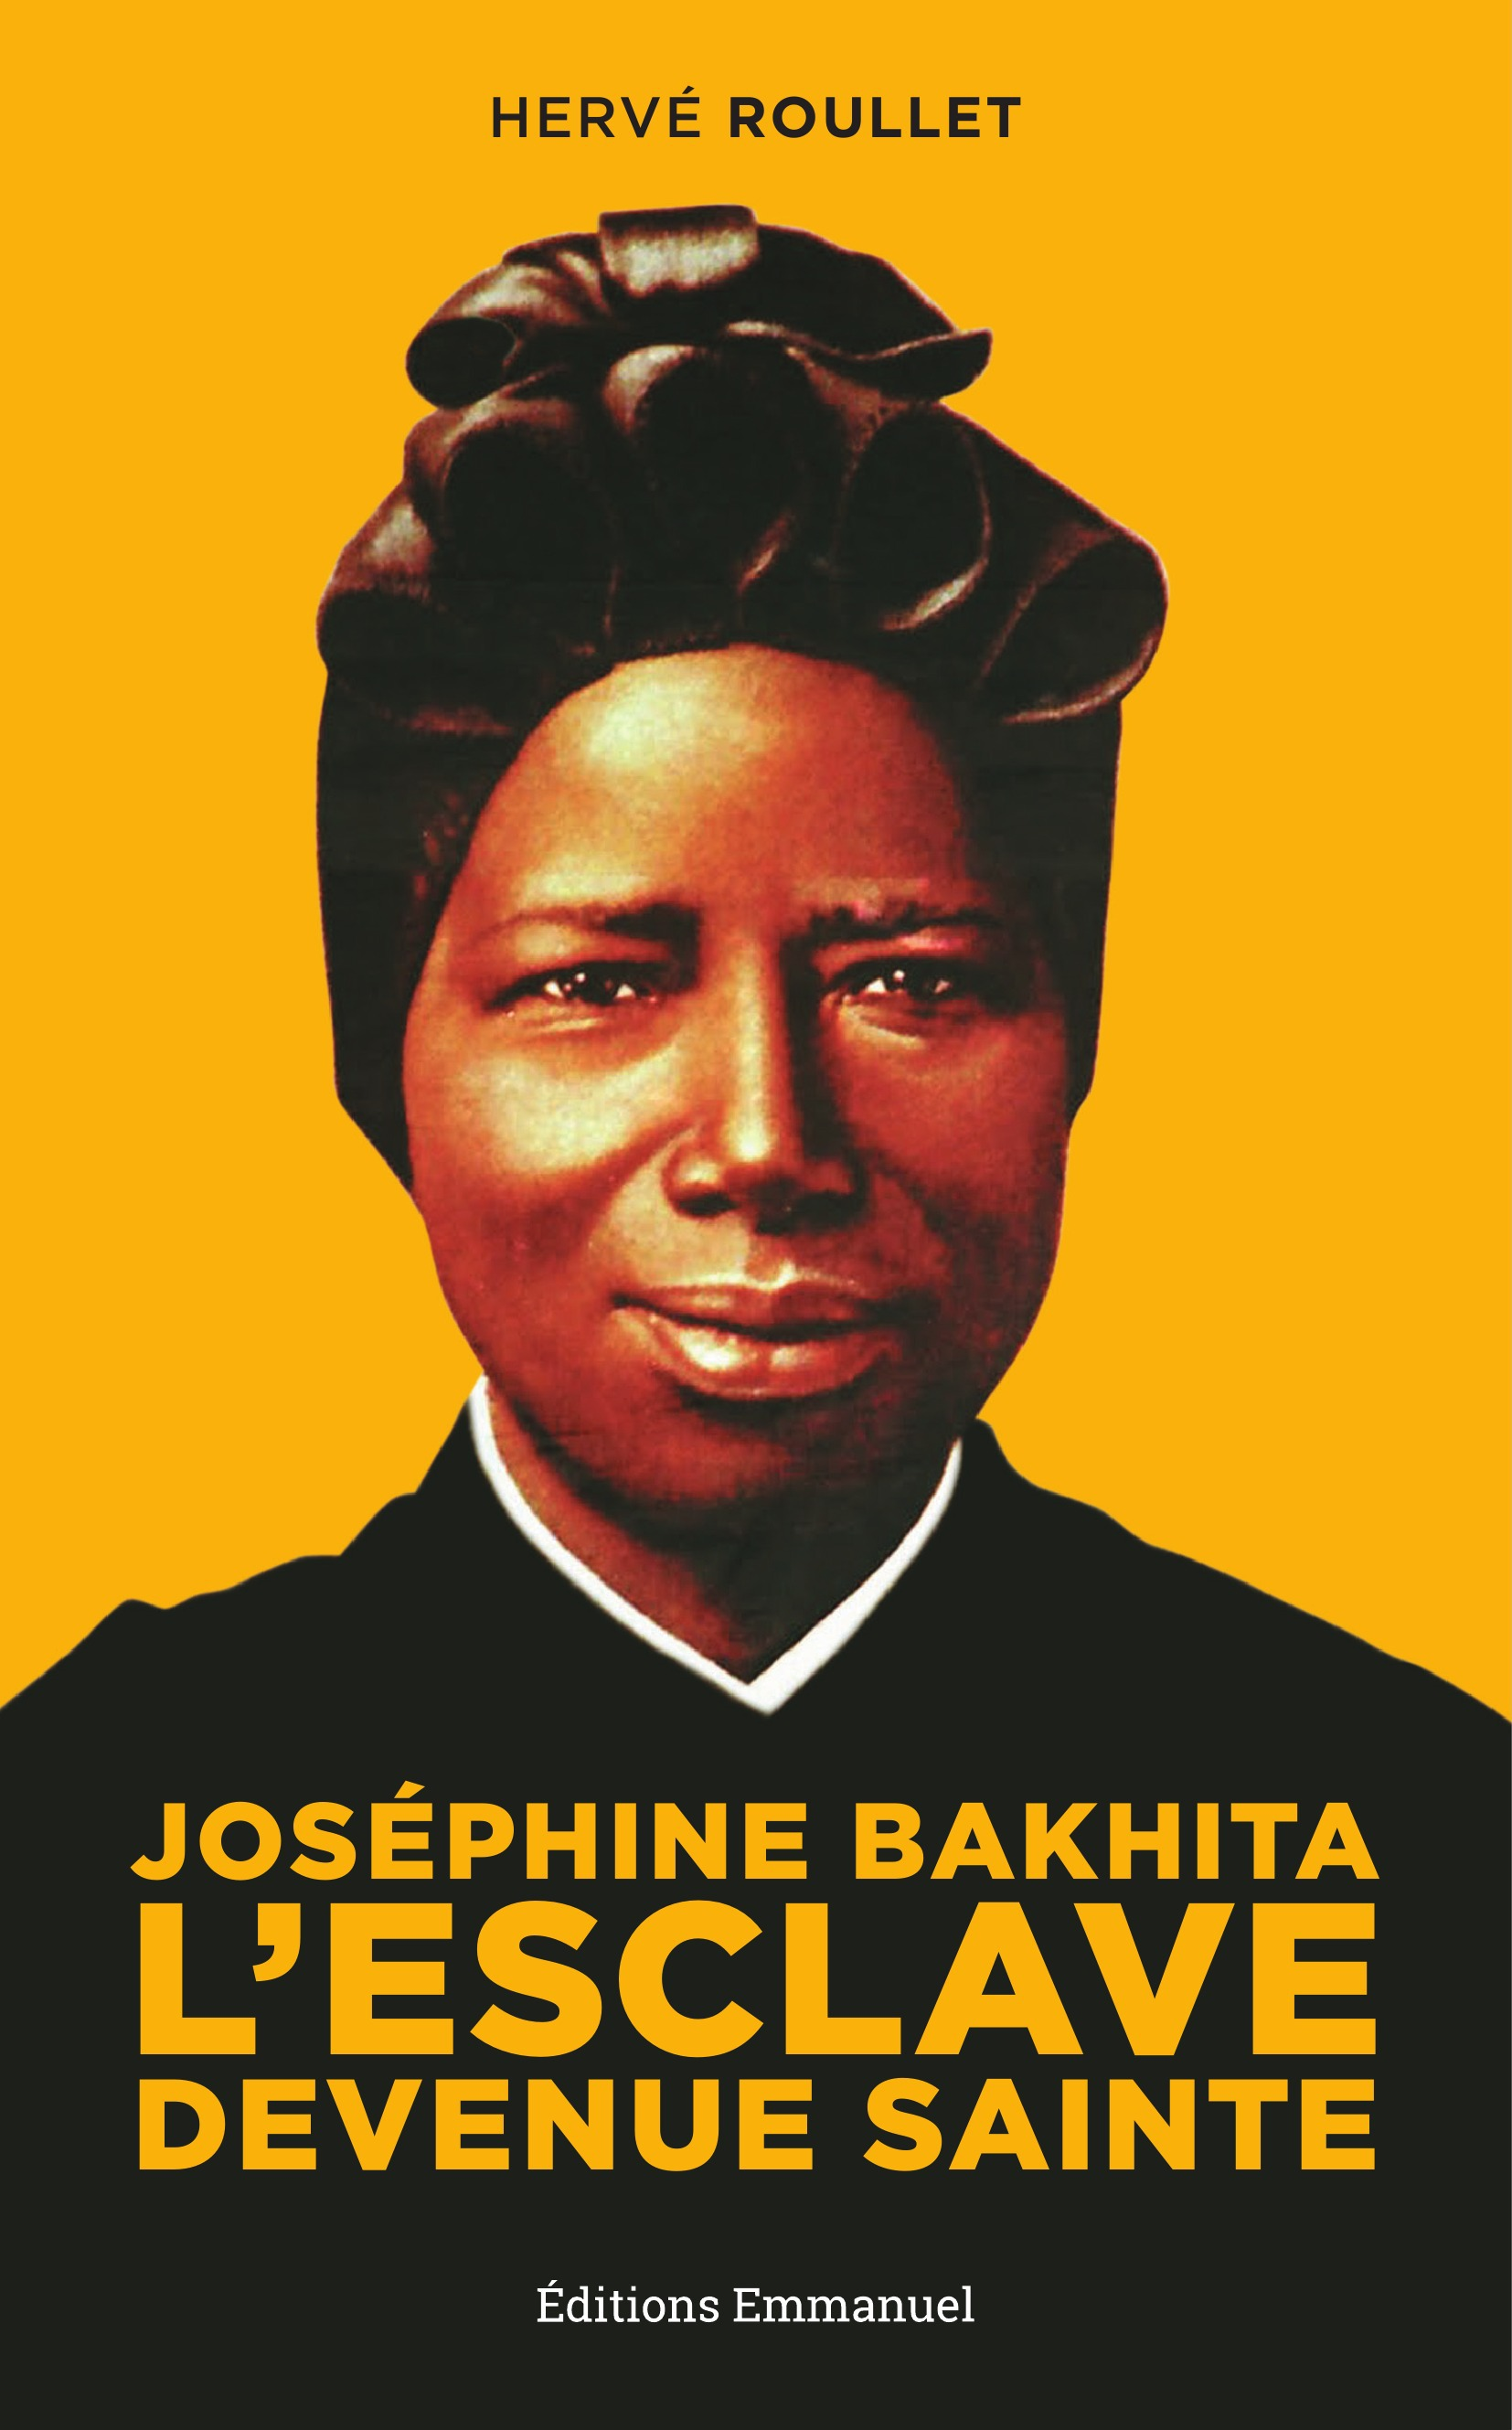 josephine bakhita l'esclave devenue sainte